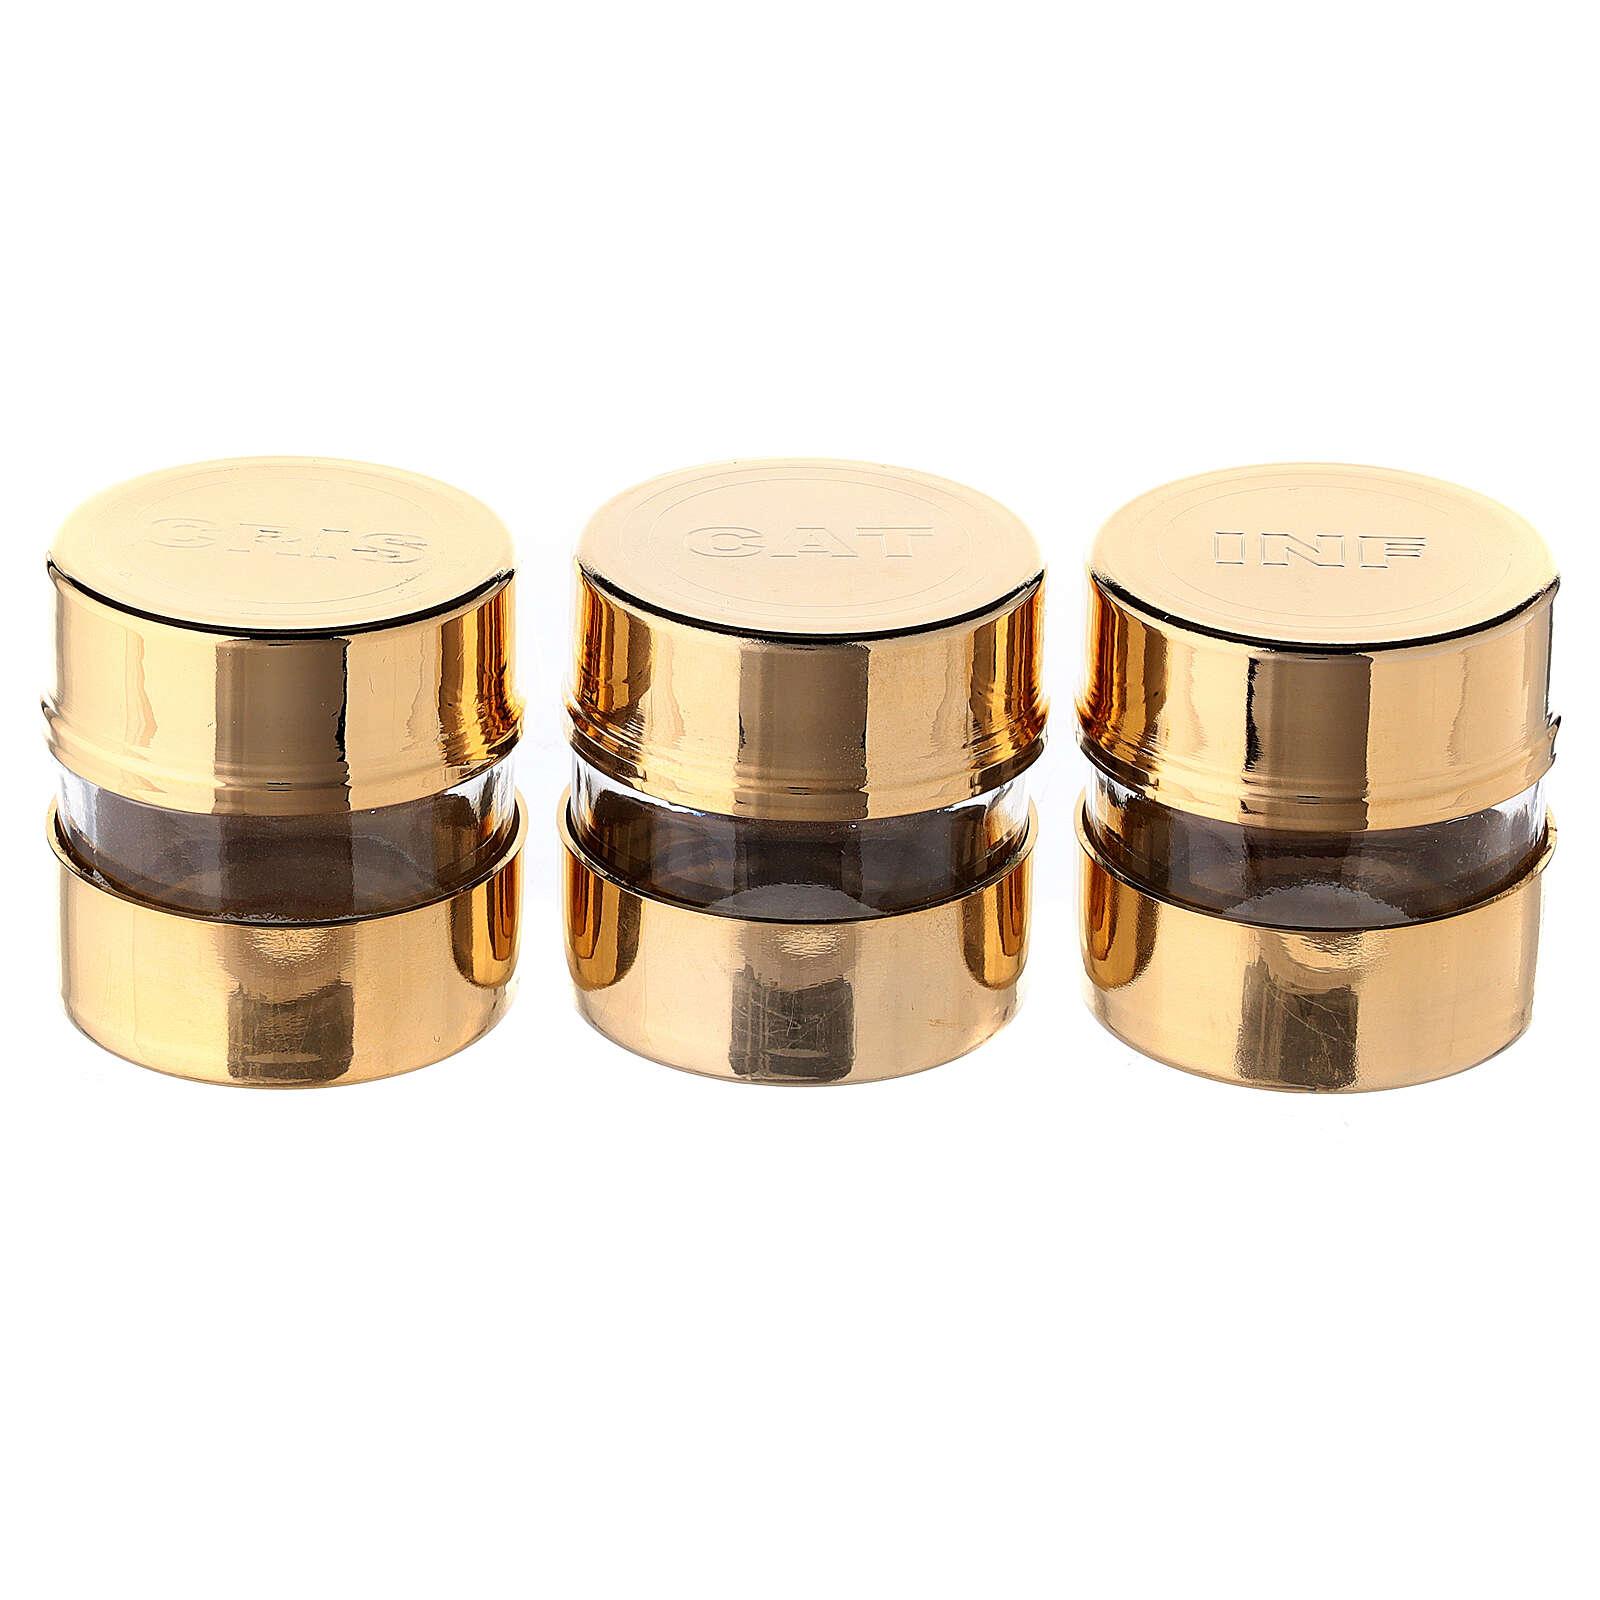 Set tres frascos para santos óleos con incisión pantografada 3